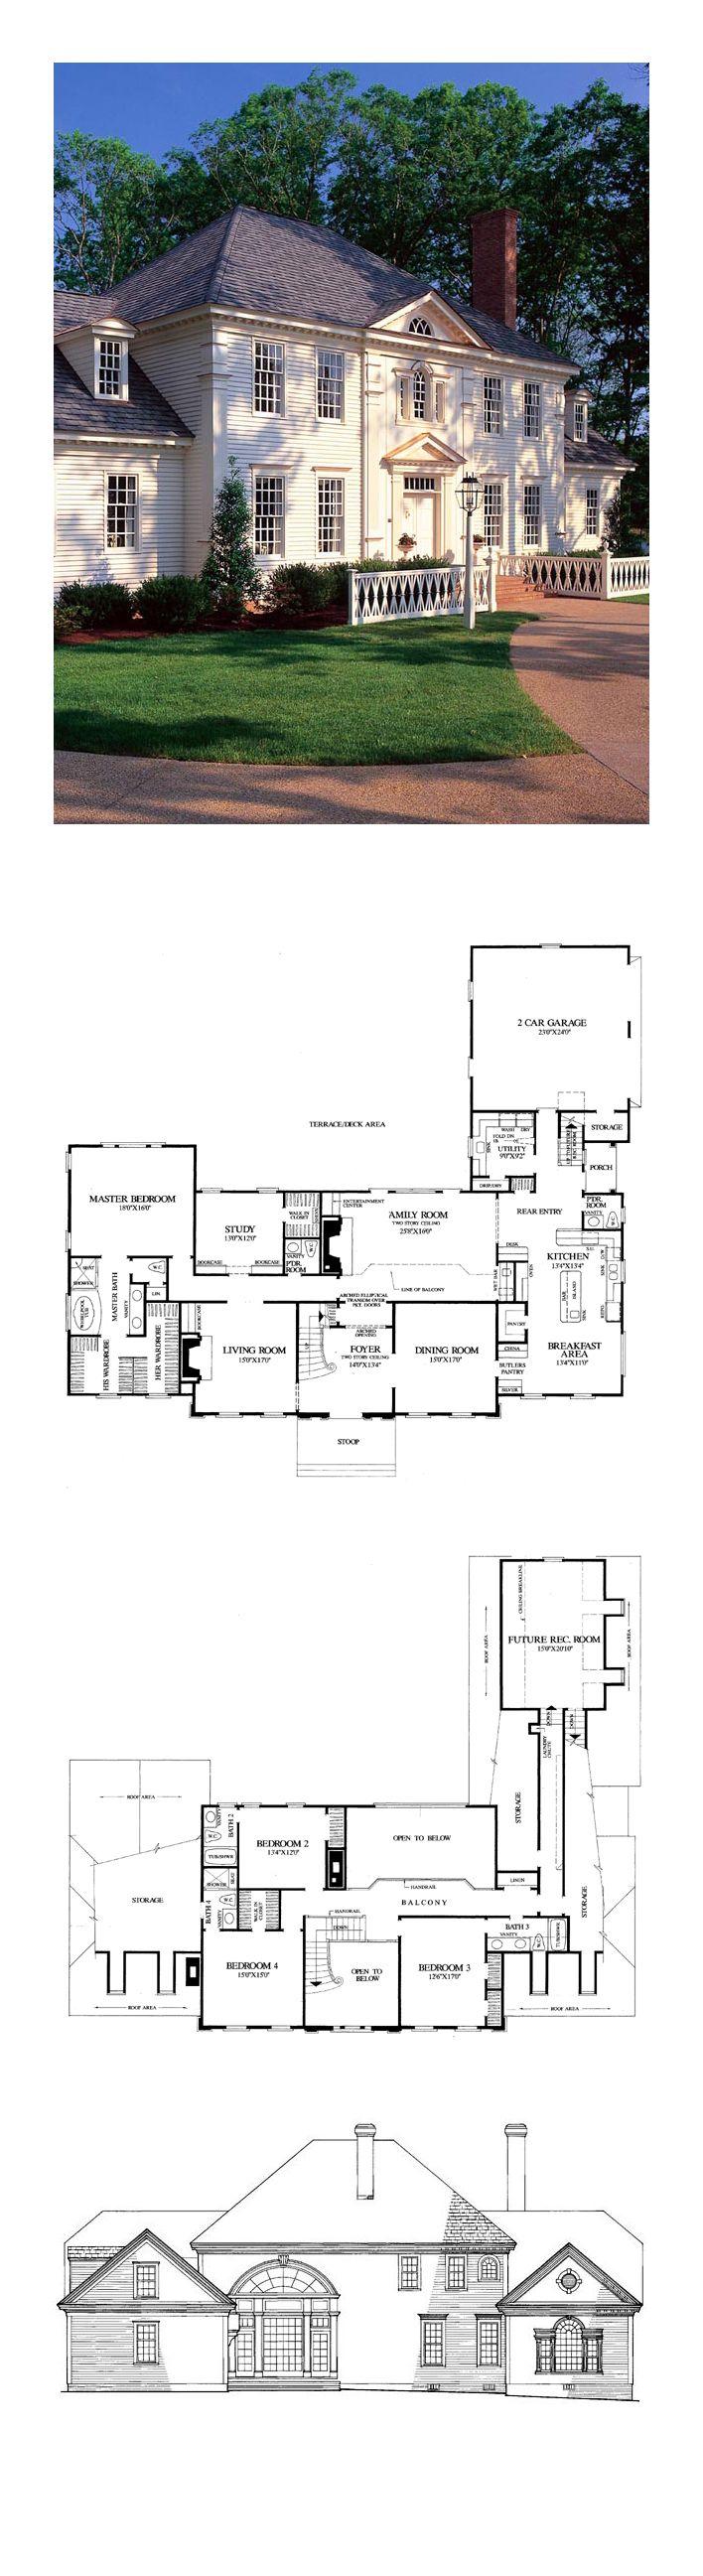 Colonial Plantation Southern House Plan 86186 50